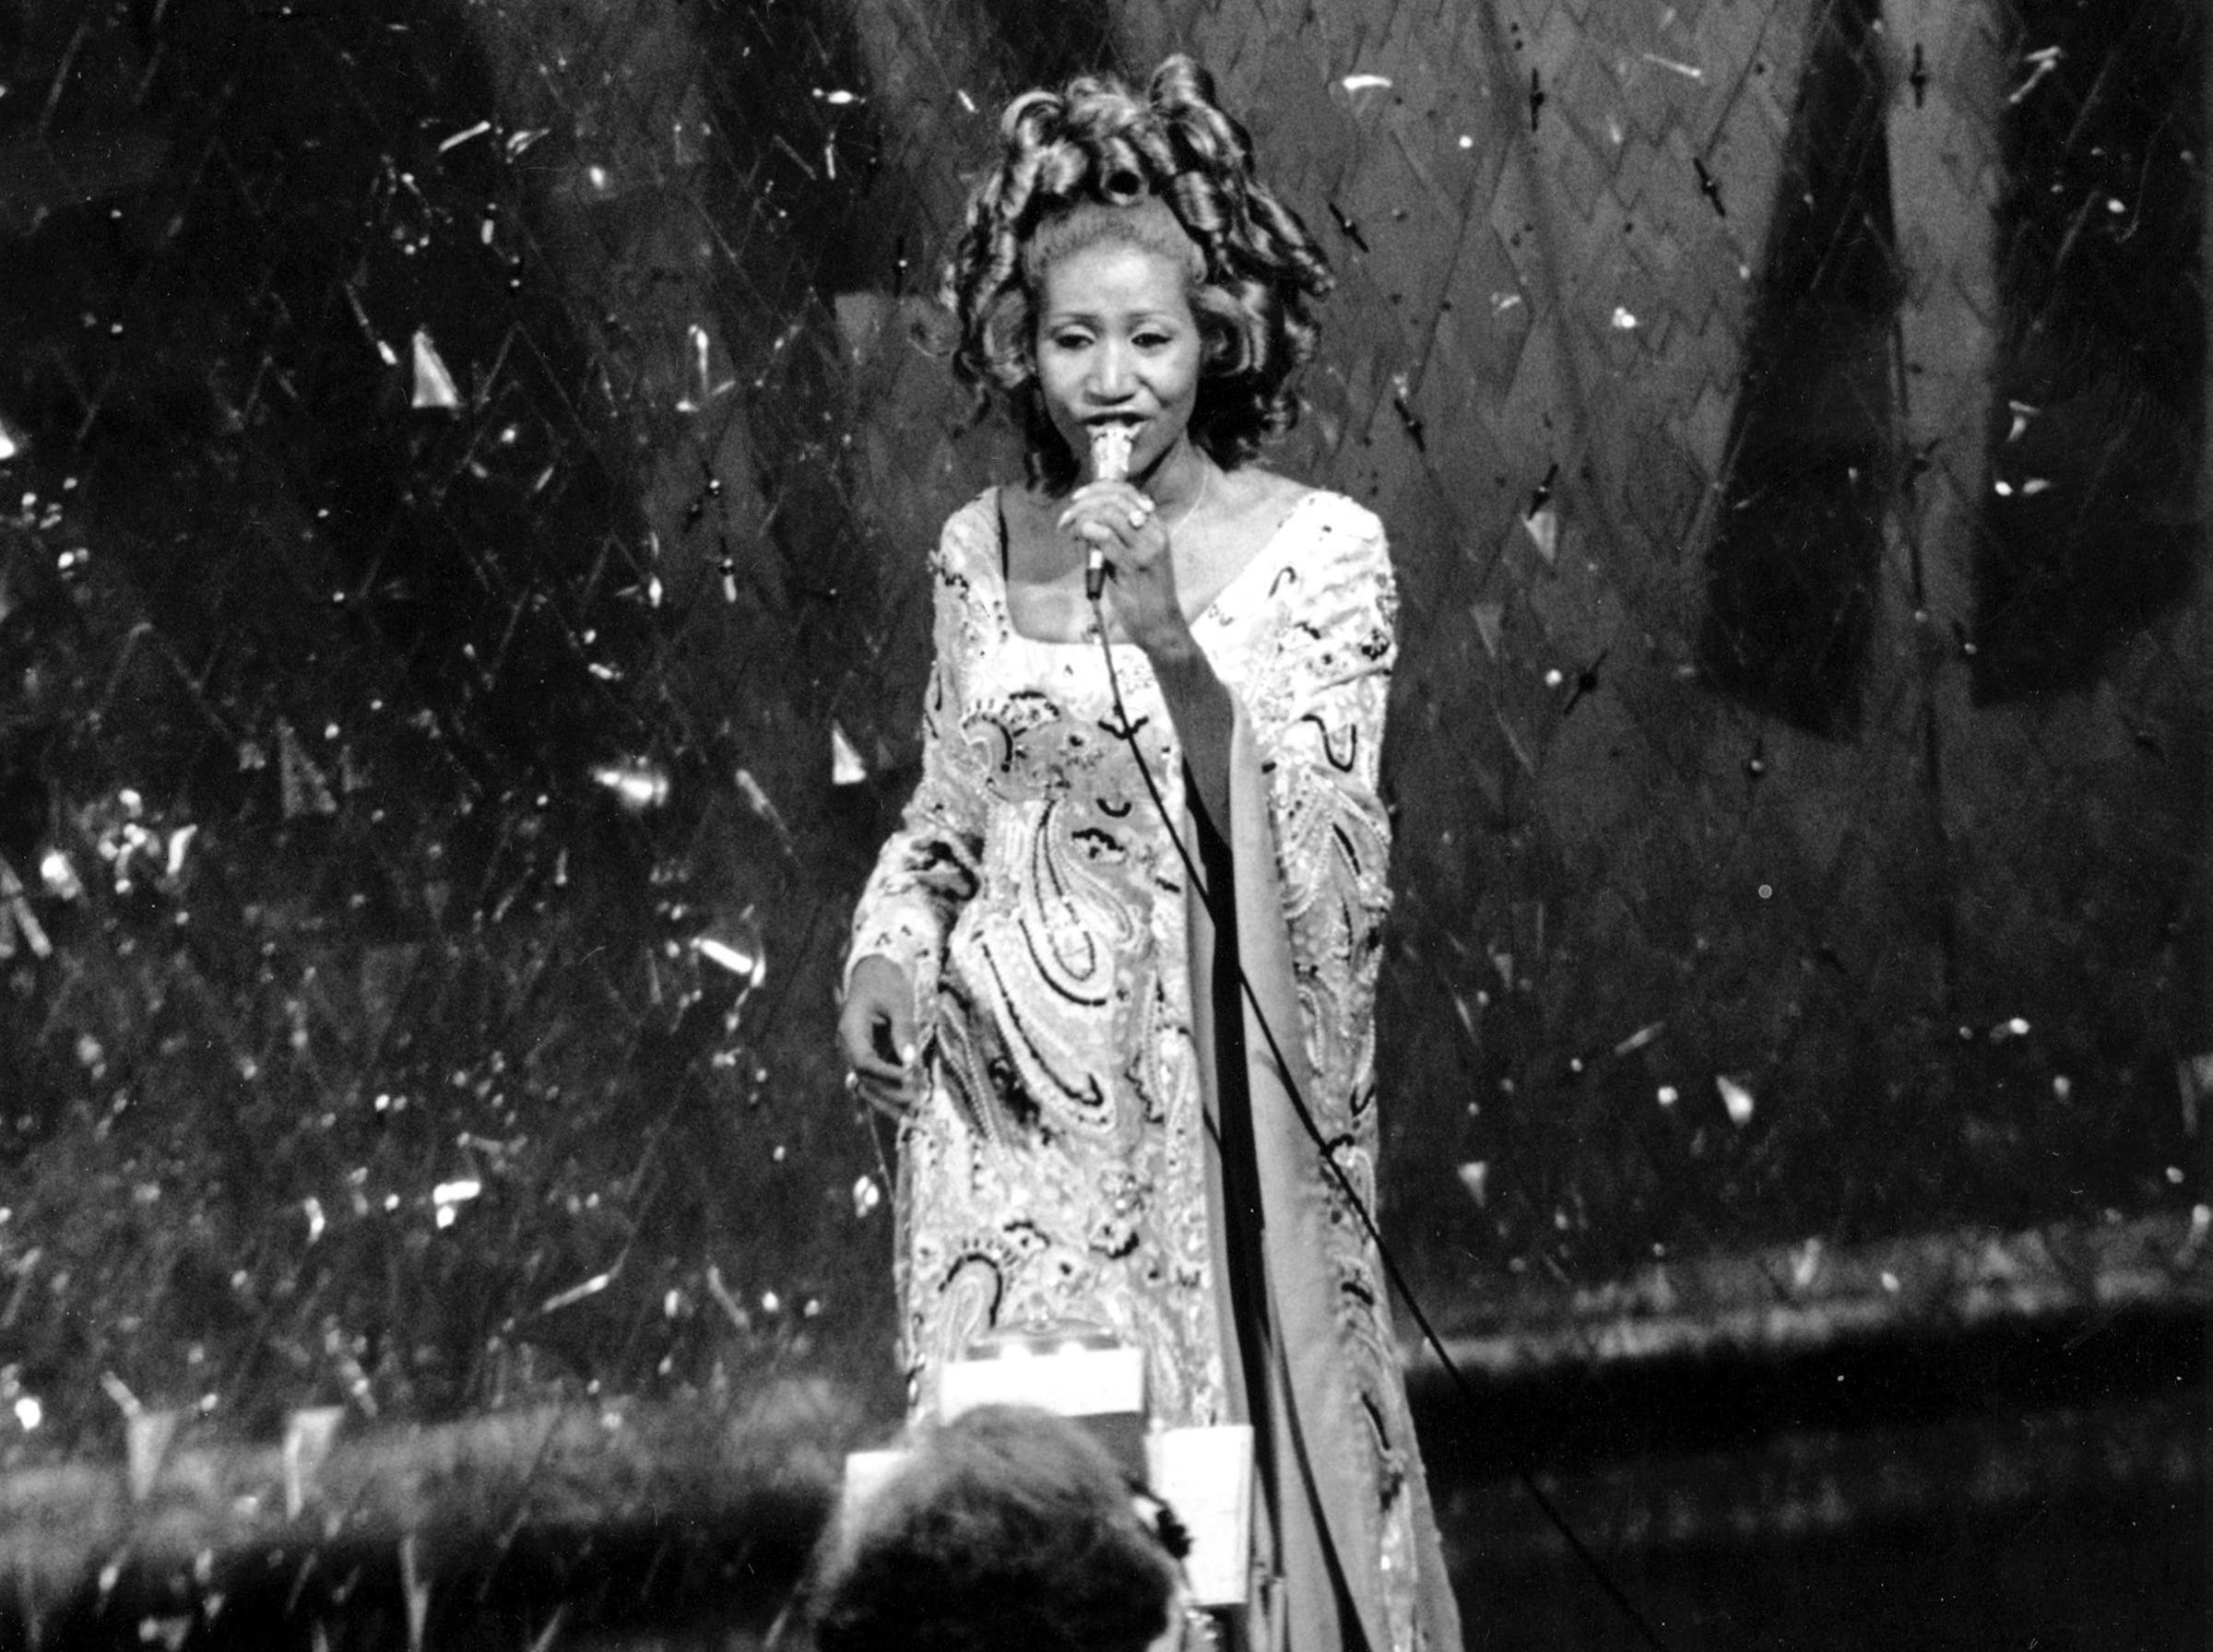 Aretha Franklin bei den Acadamy Awards 1975 in Los Angeles. (Bild: KEYSTONE/AP Photo)